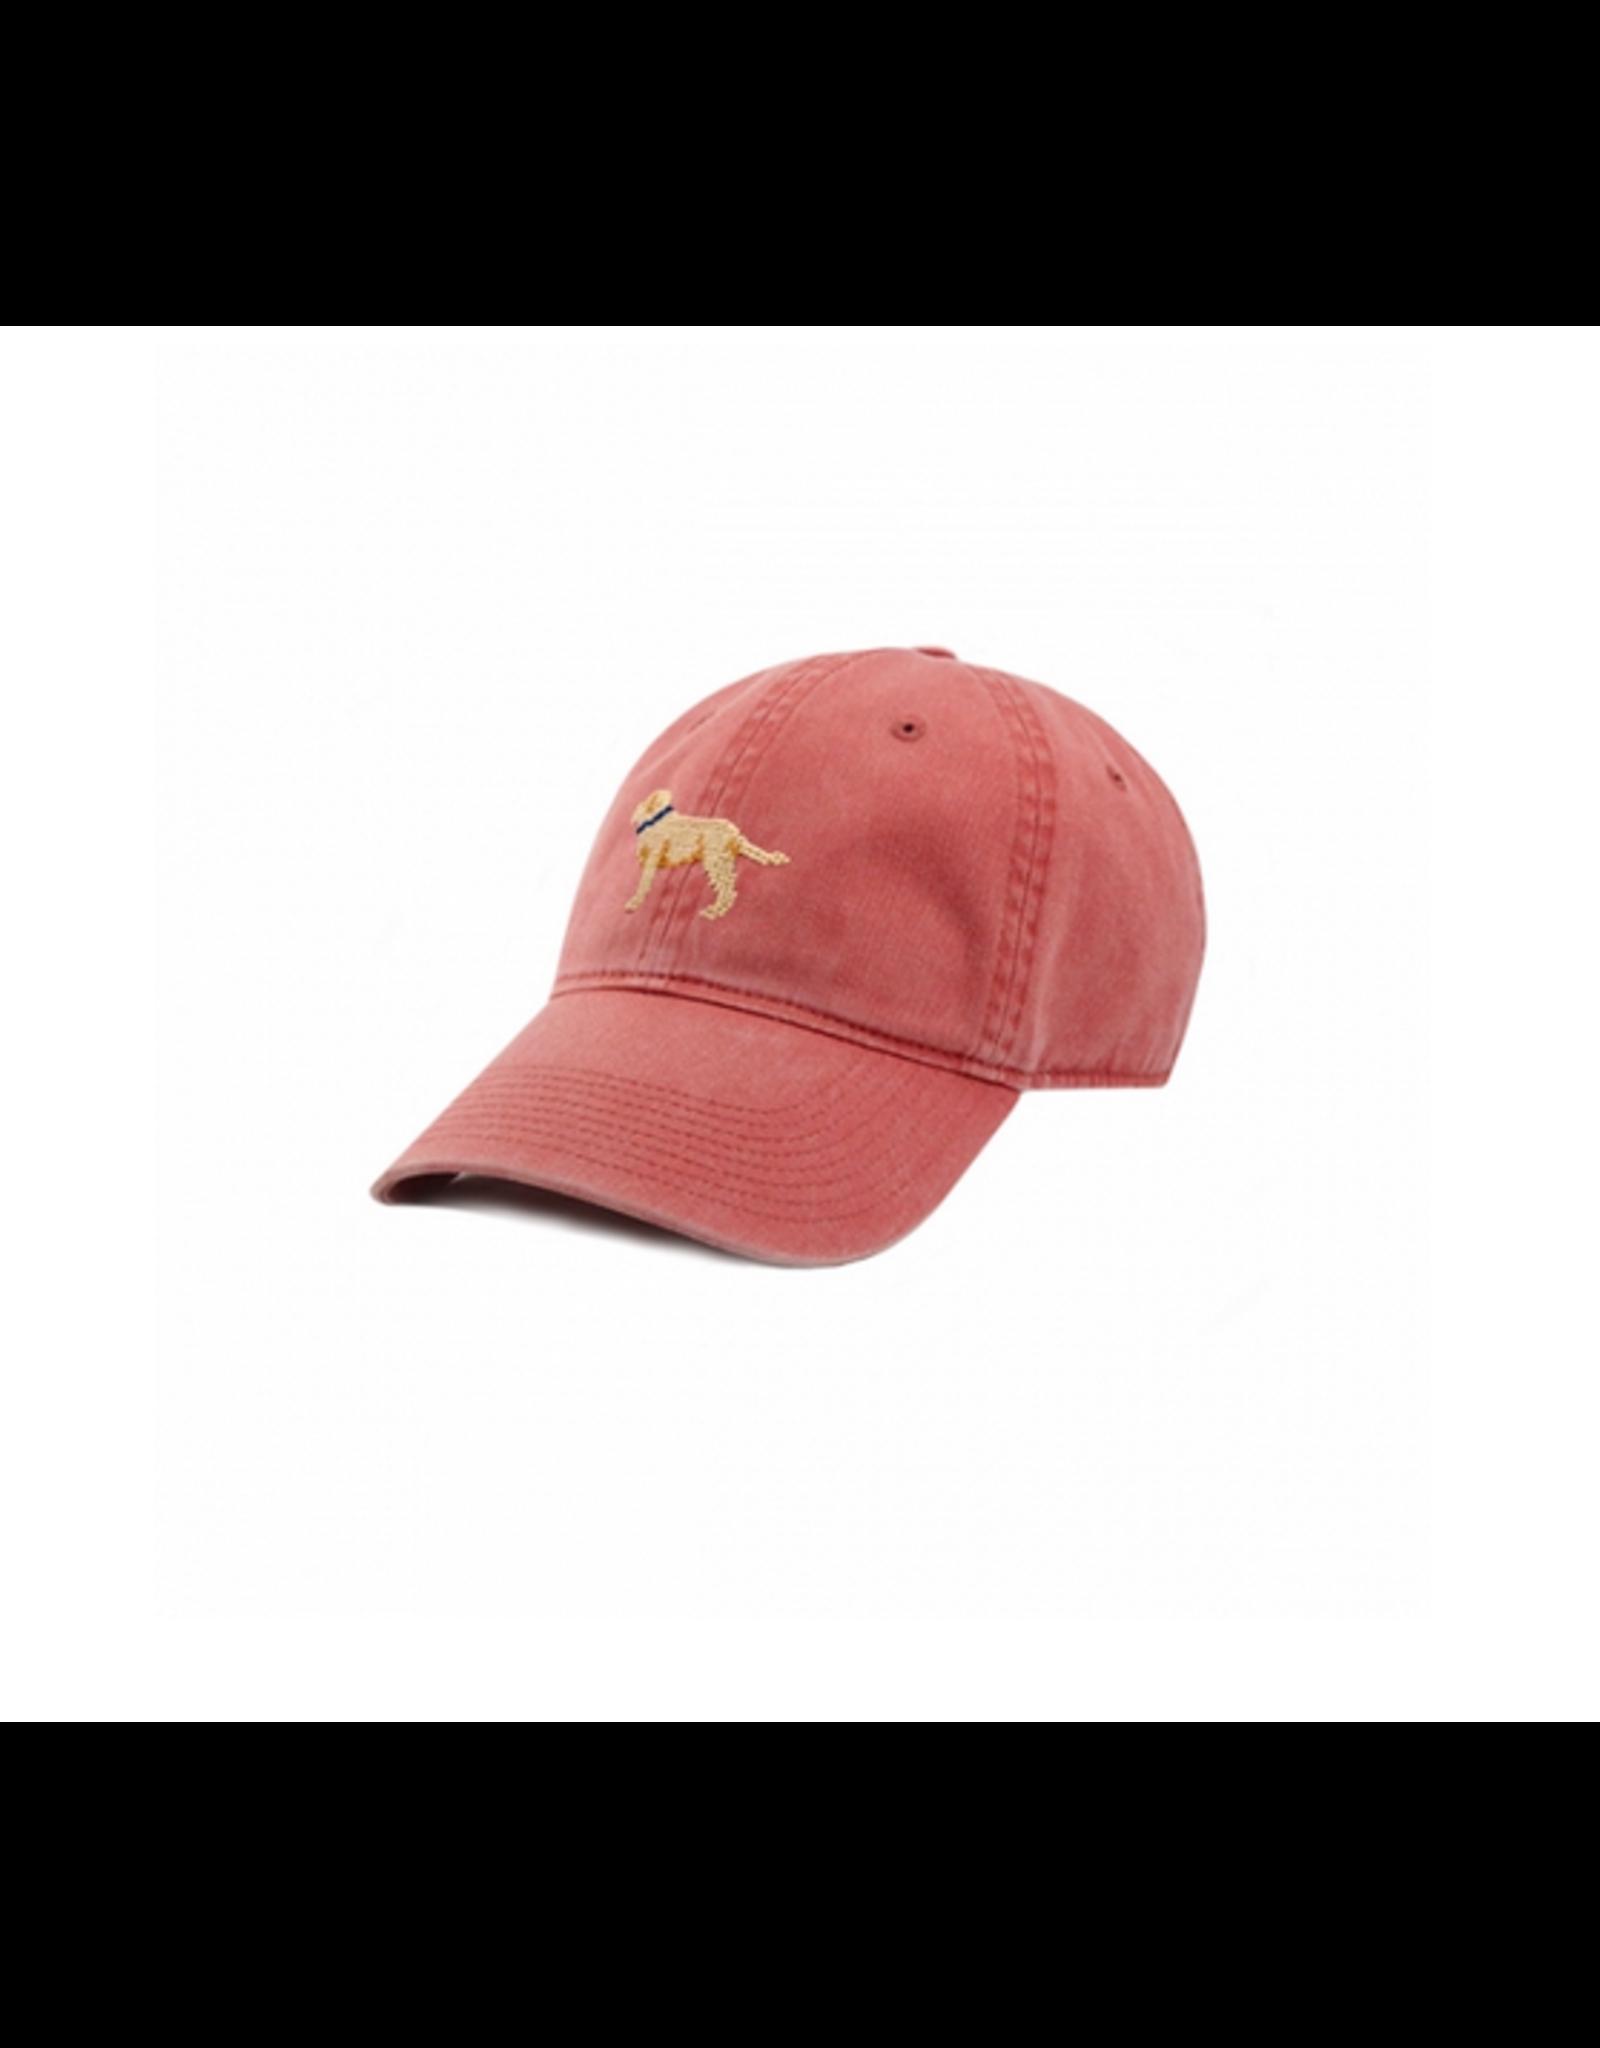 Smathers & Branson S&B Needlepoint Ball Hat, Yellow Lab on Nantucket Red